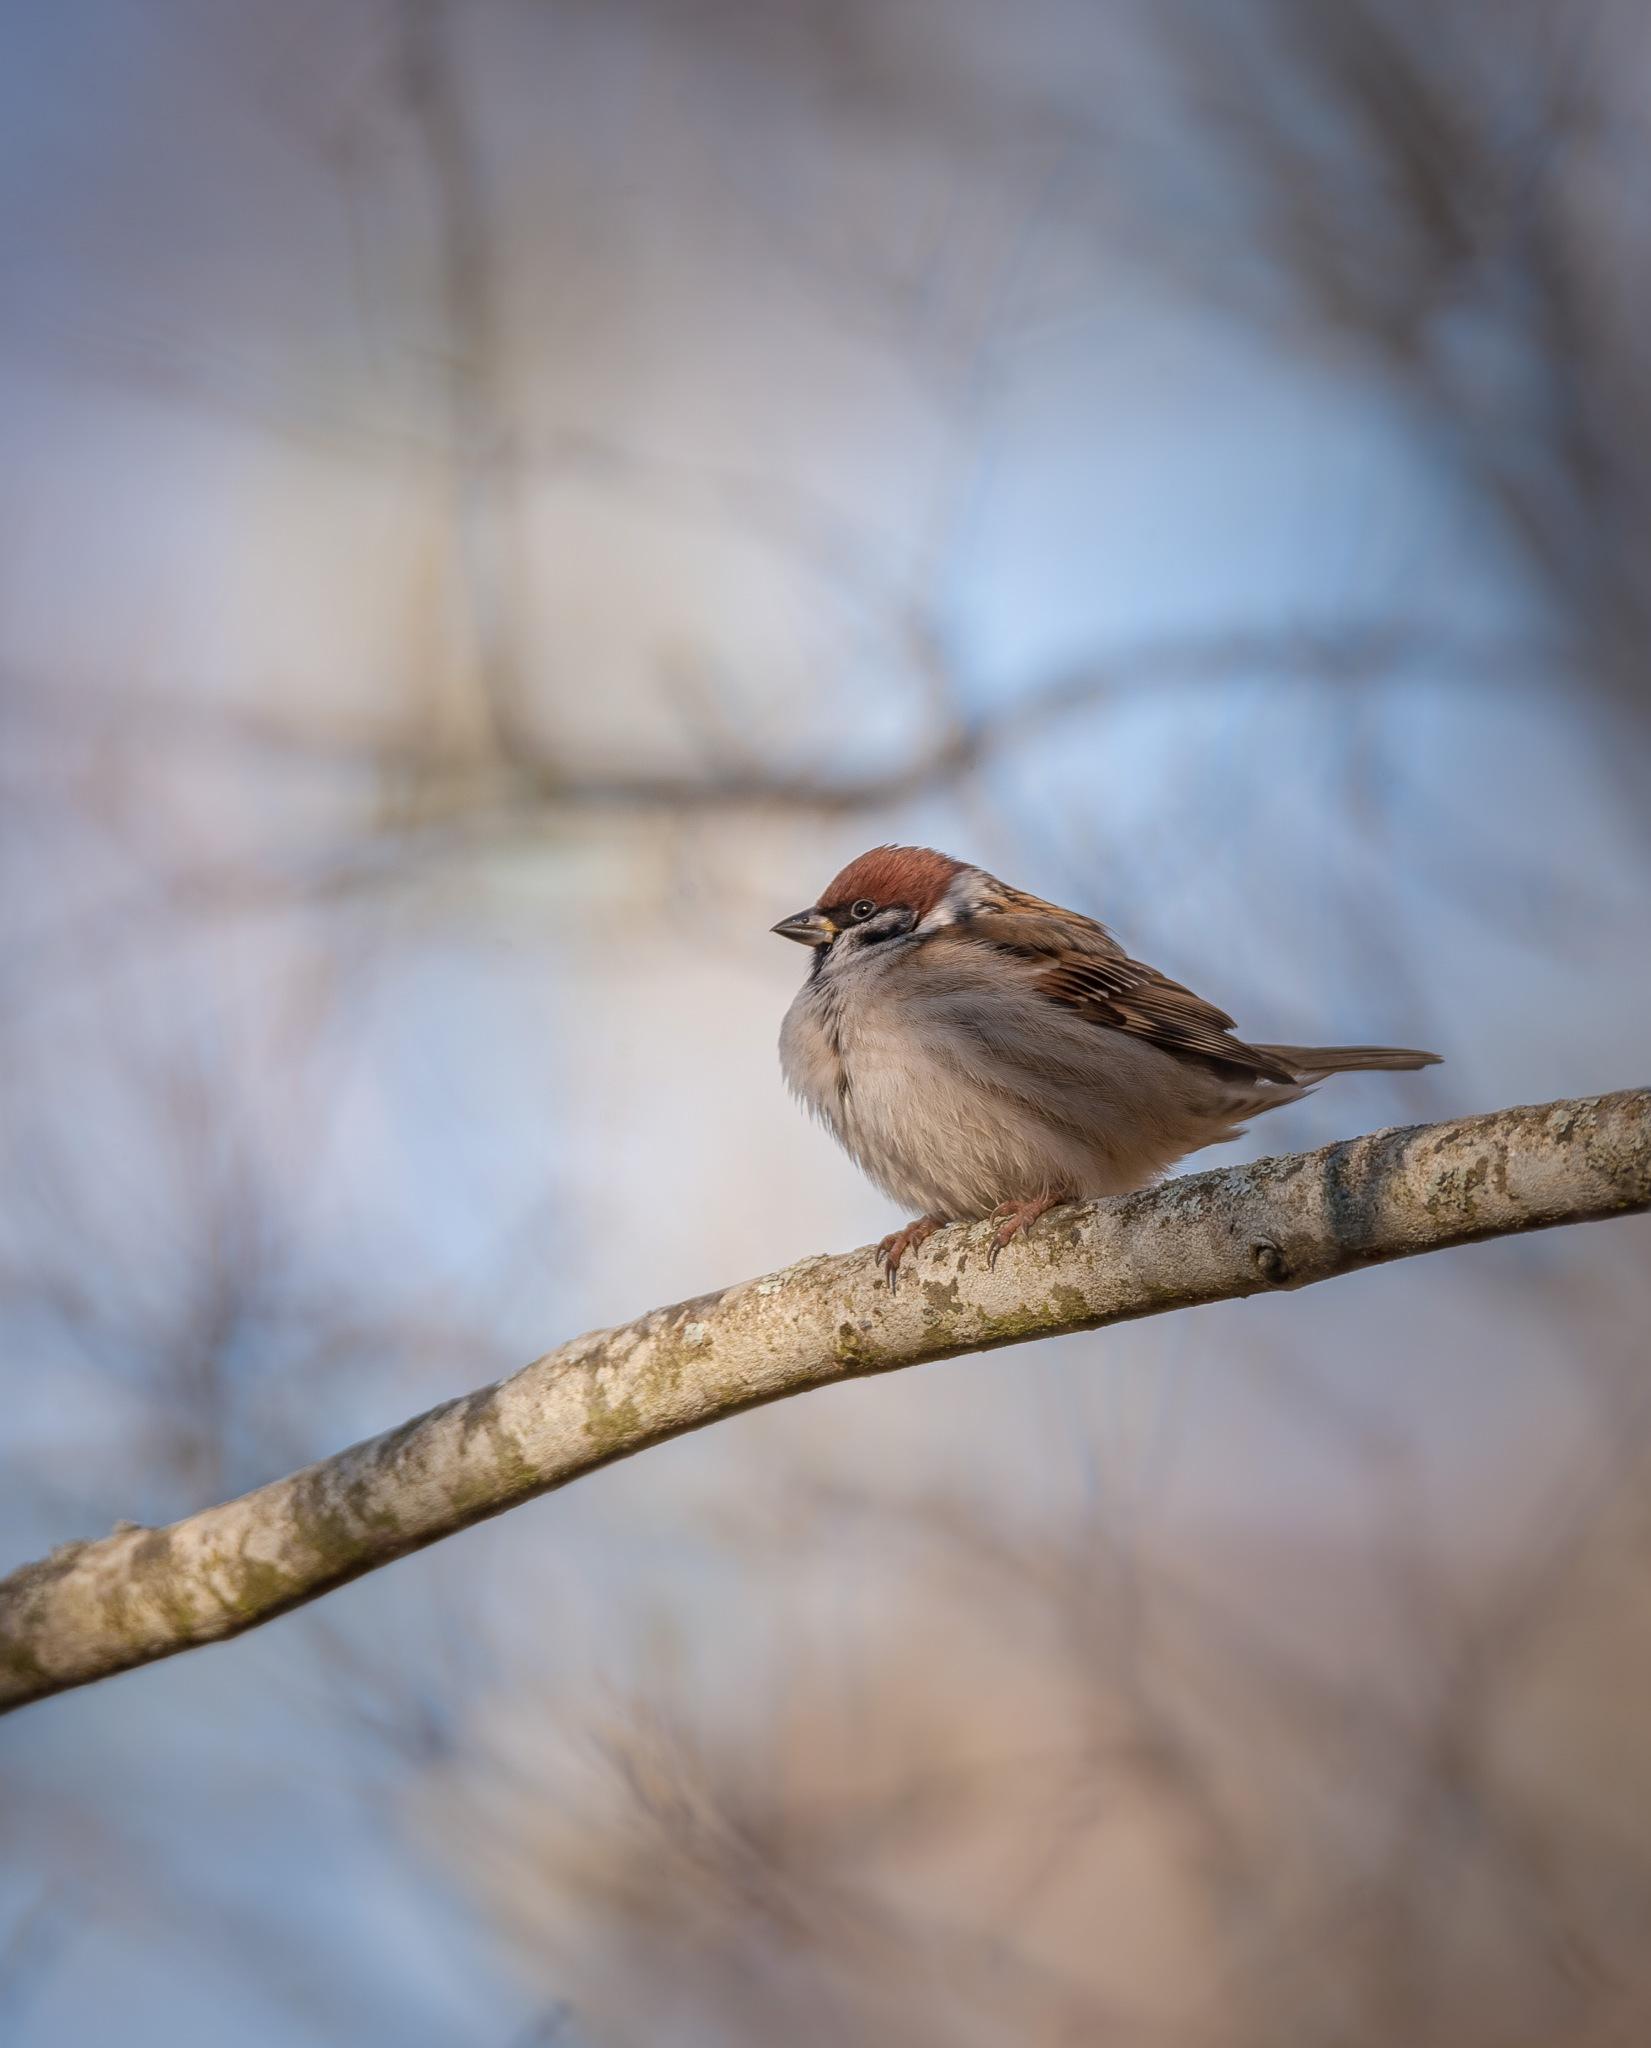 Eurasian tree sparrow by anne-b